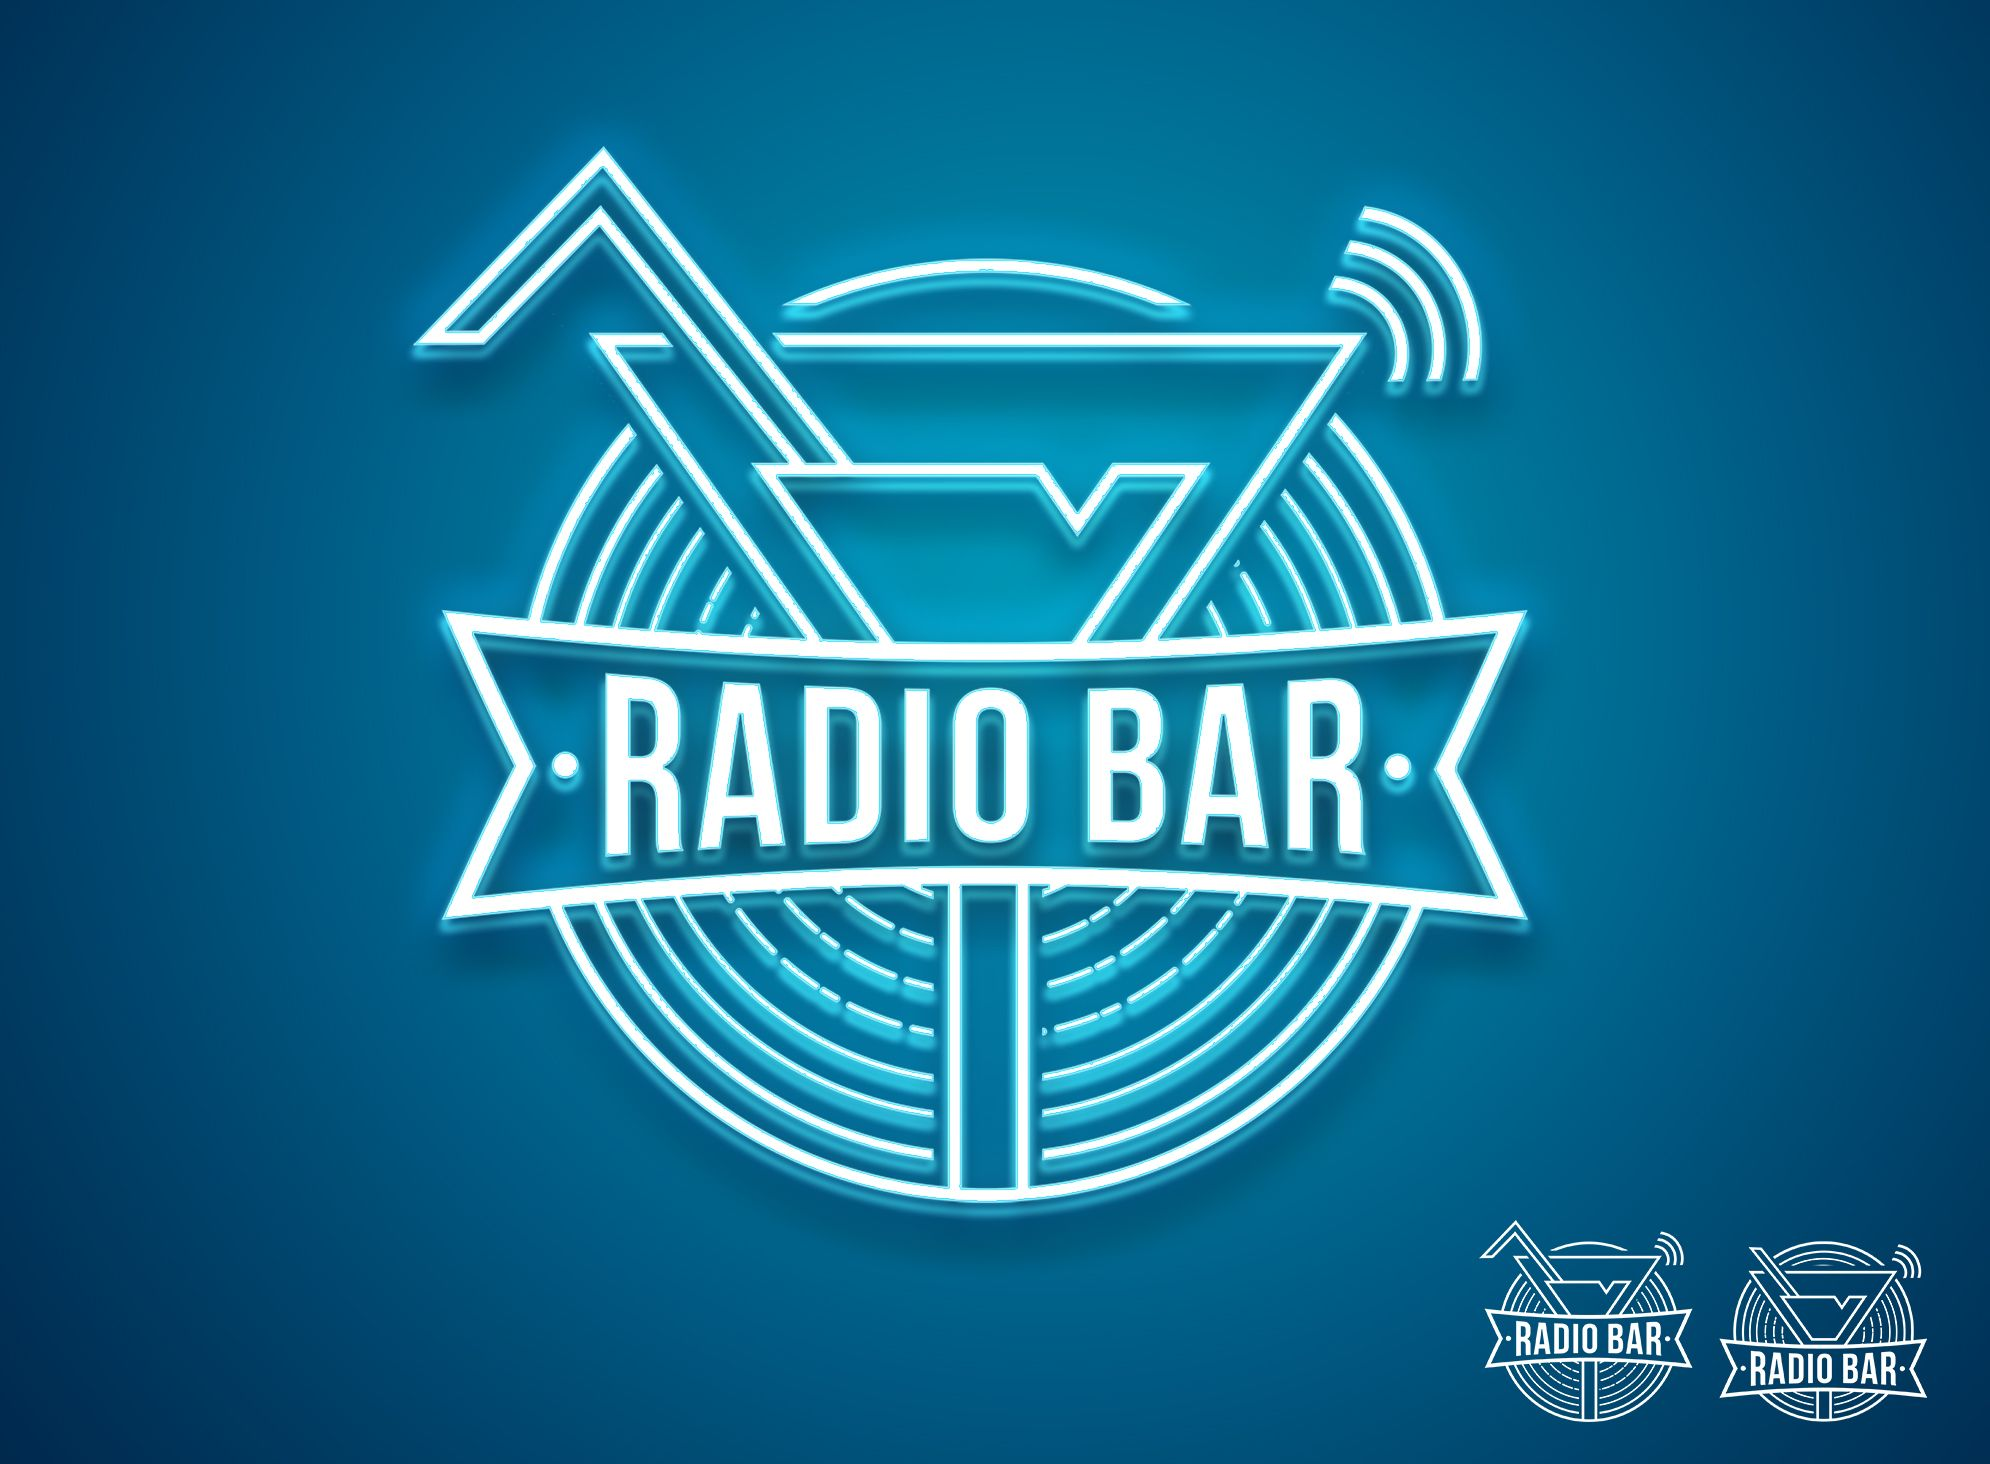 Логотип для Radio bar - дизайнер Logostev